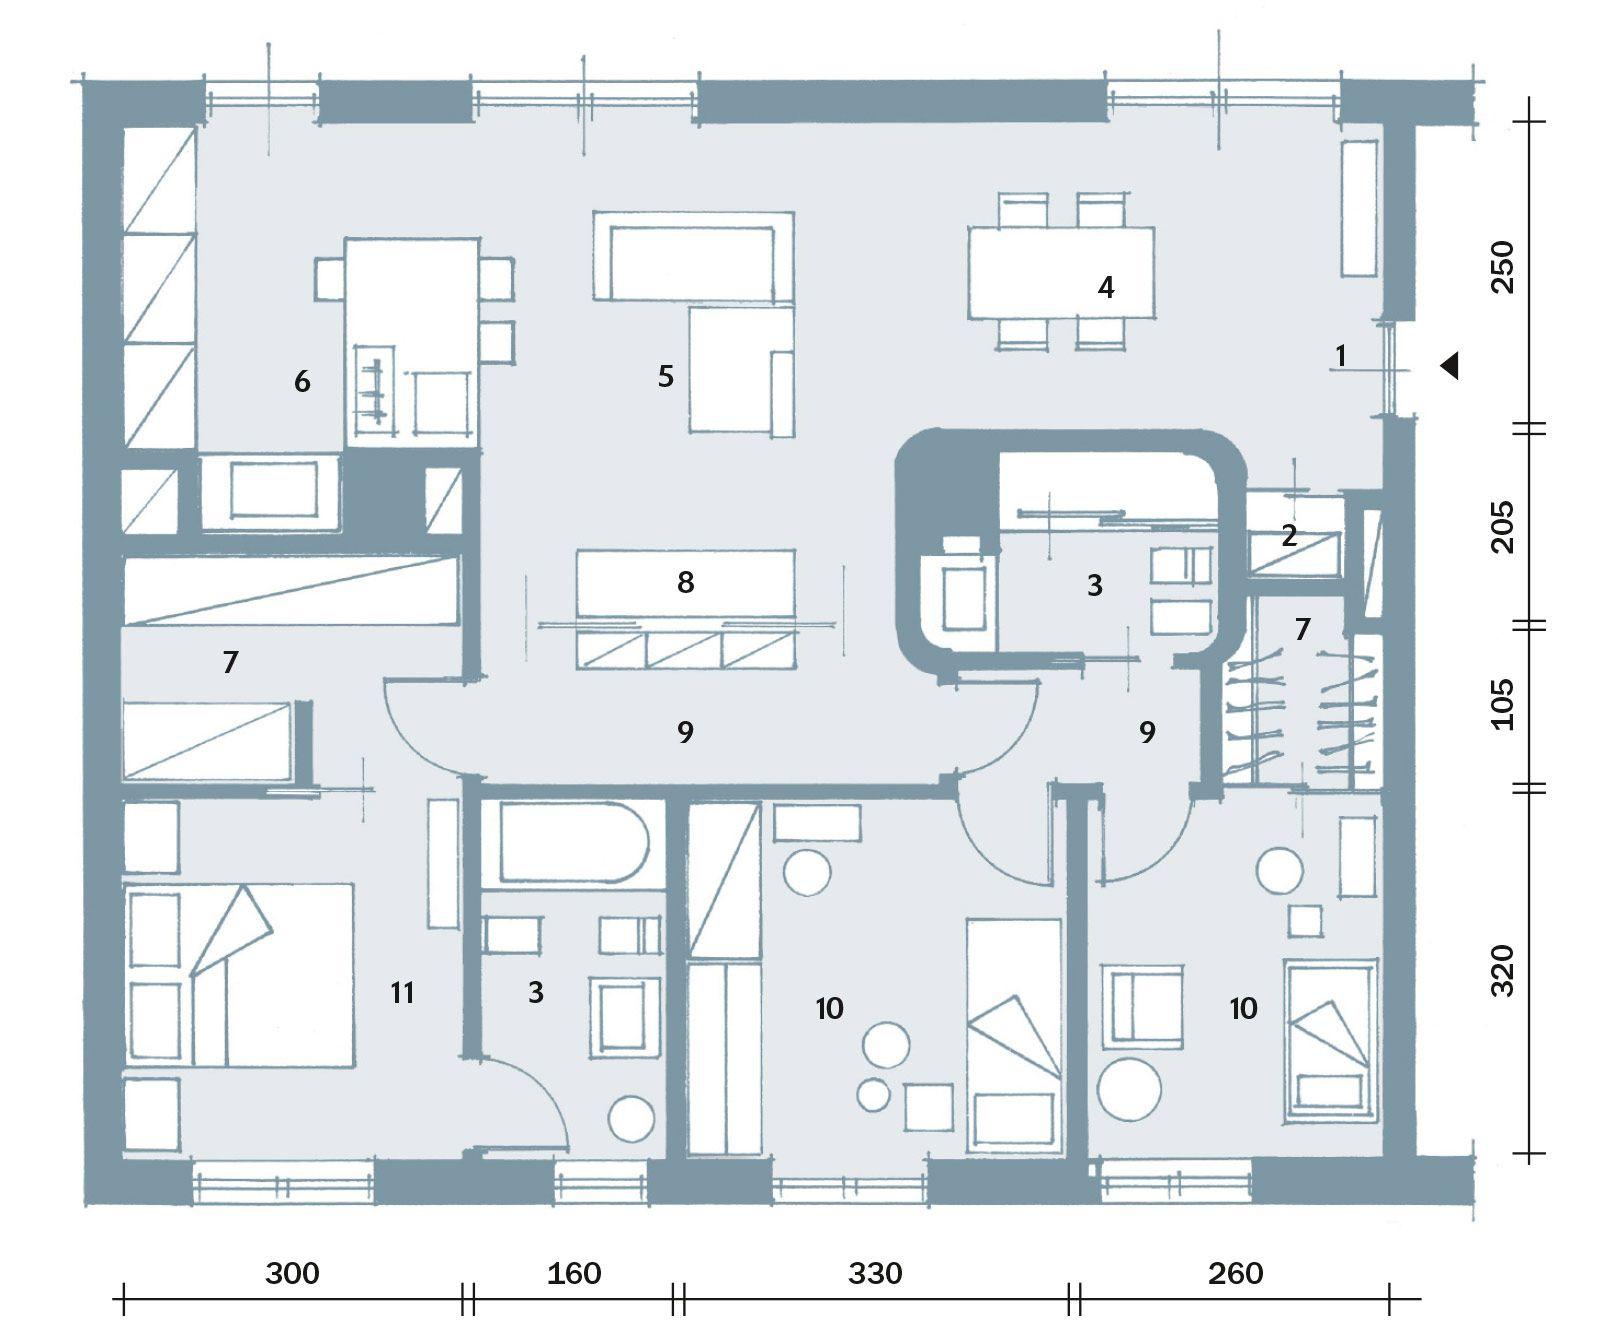 Planimetria Casa 120 Mq Casa Pinterest Haus E Projekte